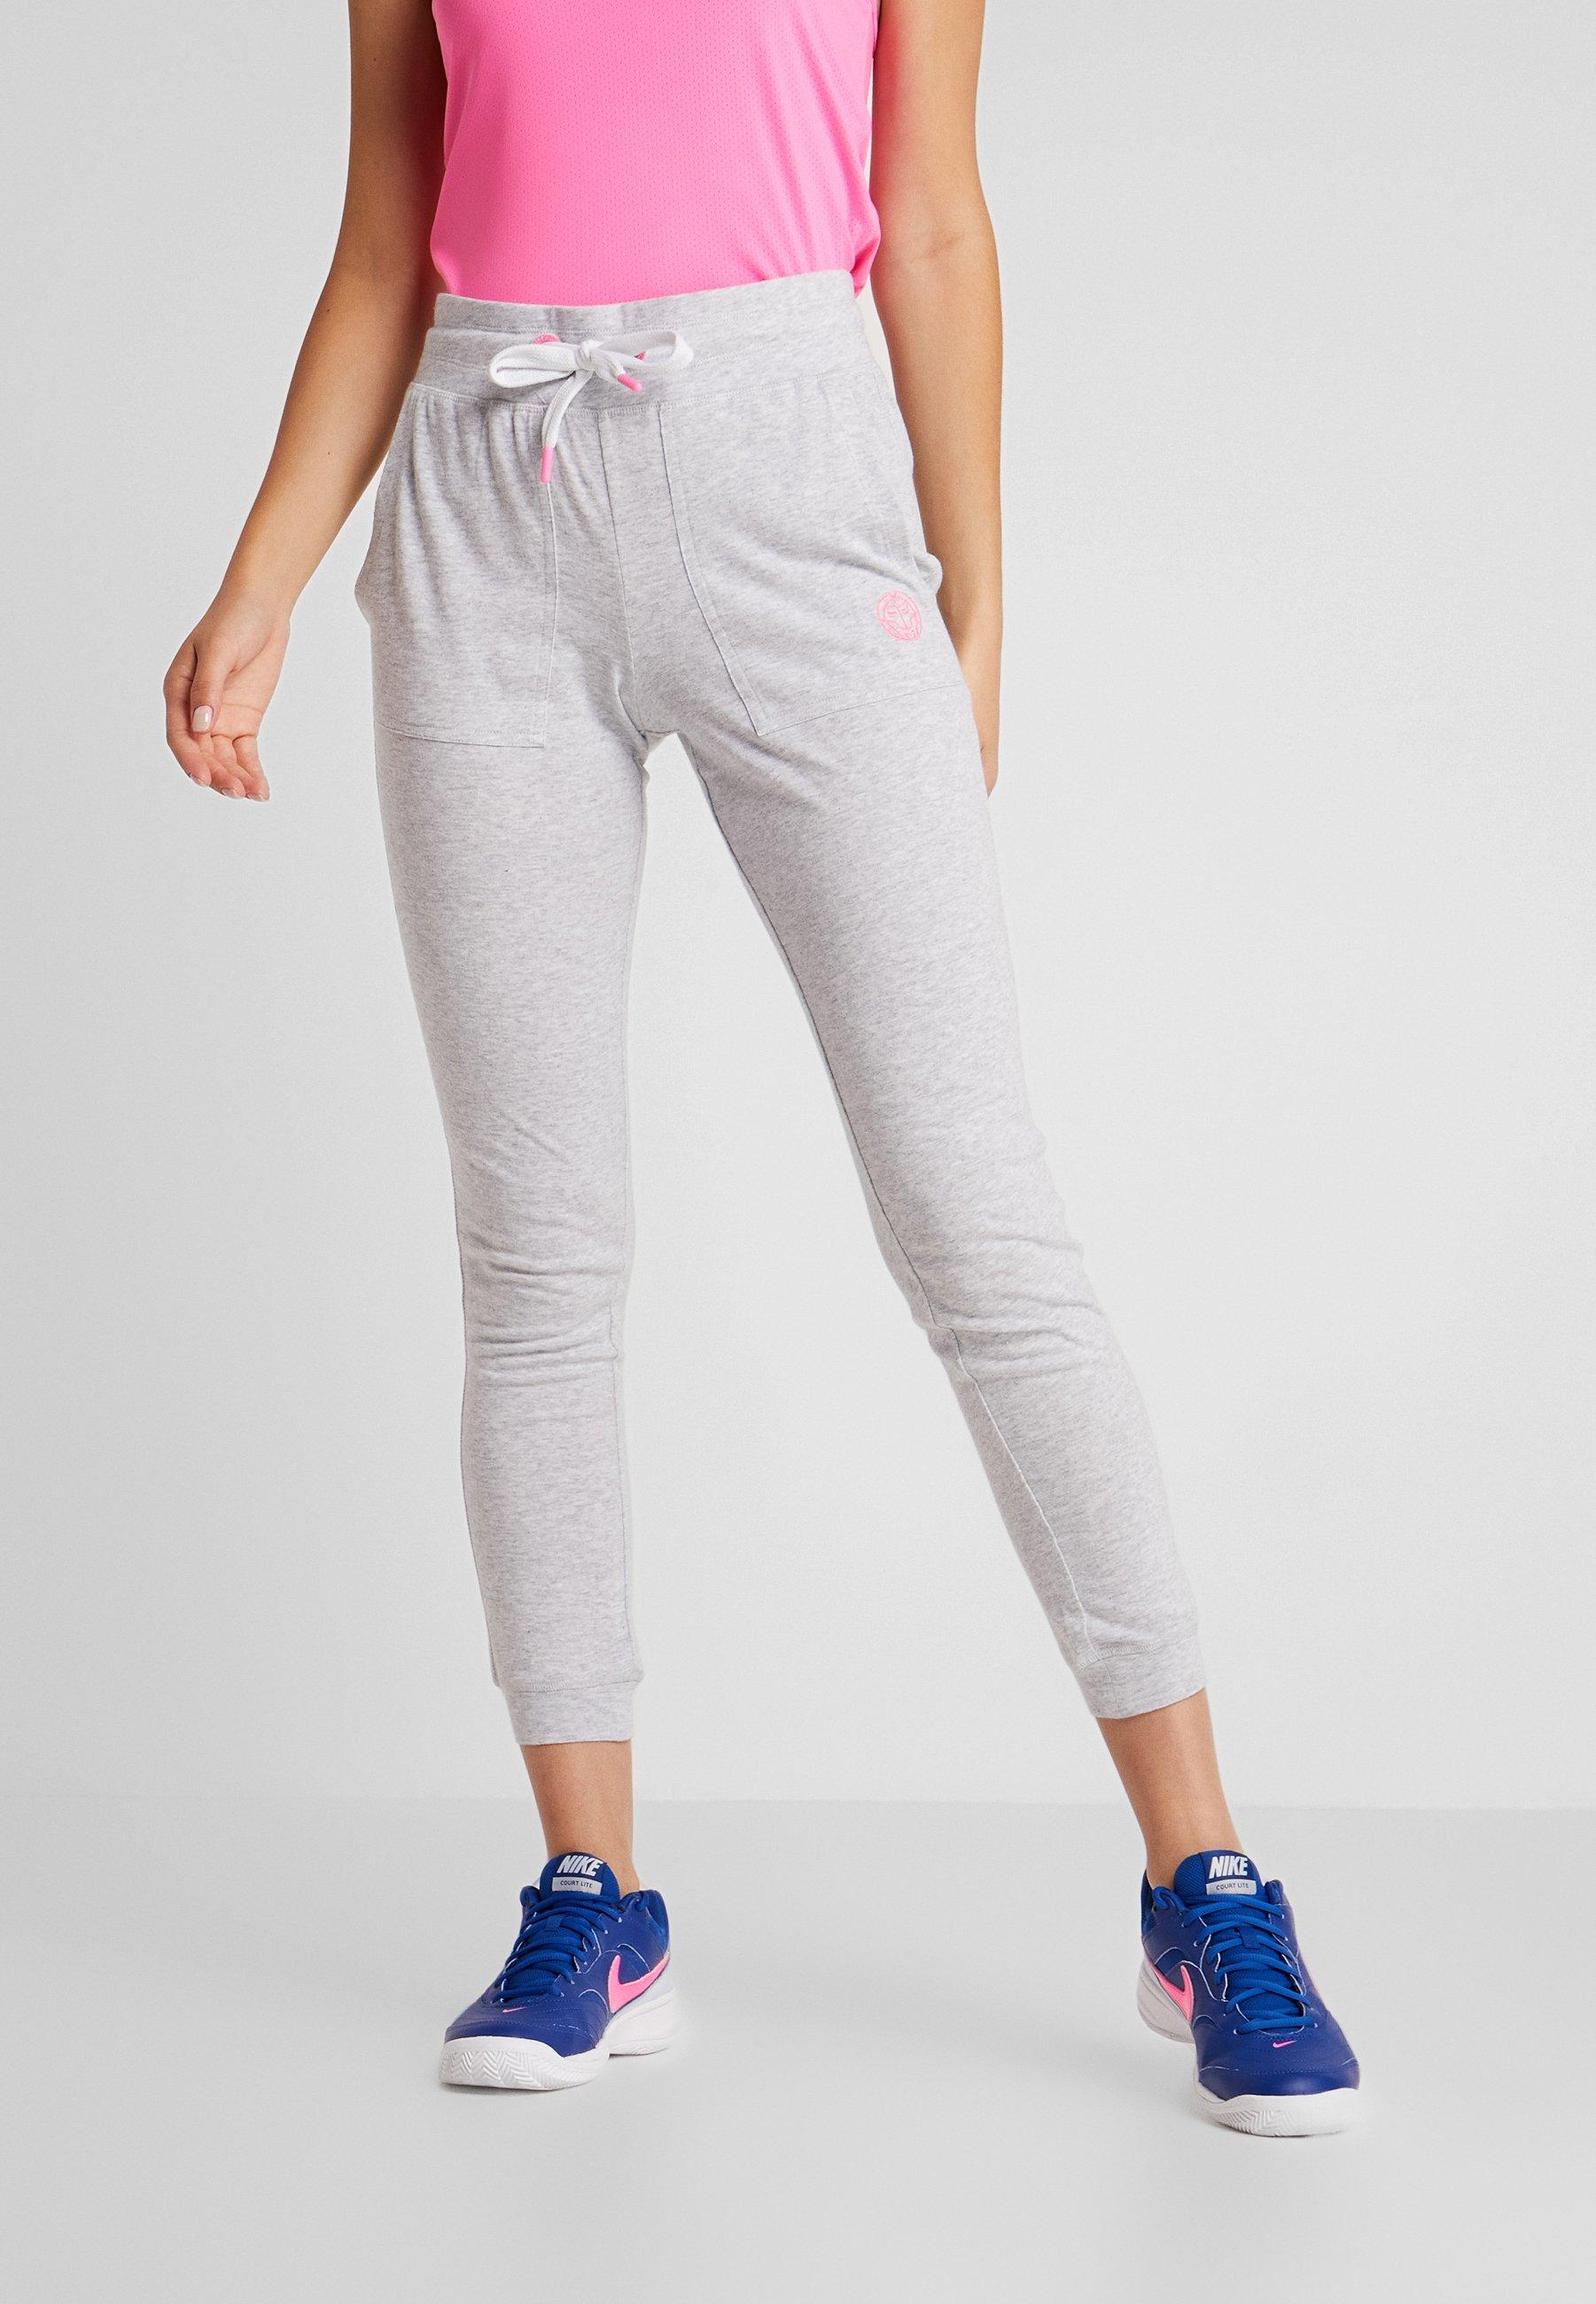 BIDI BADU PERLA BASIC PANT - Jogginghose light grey